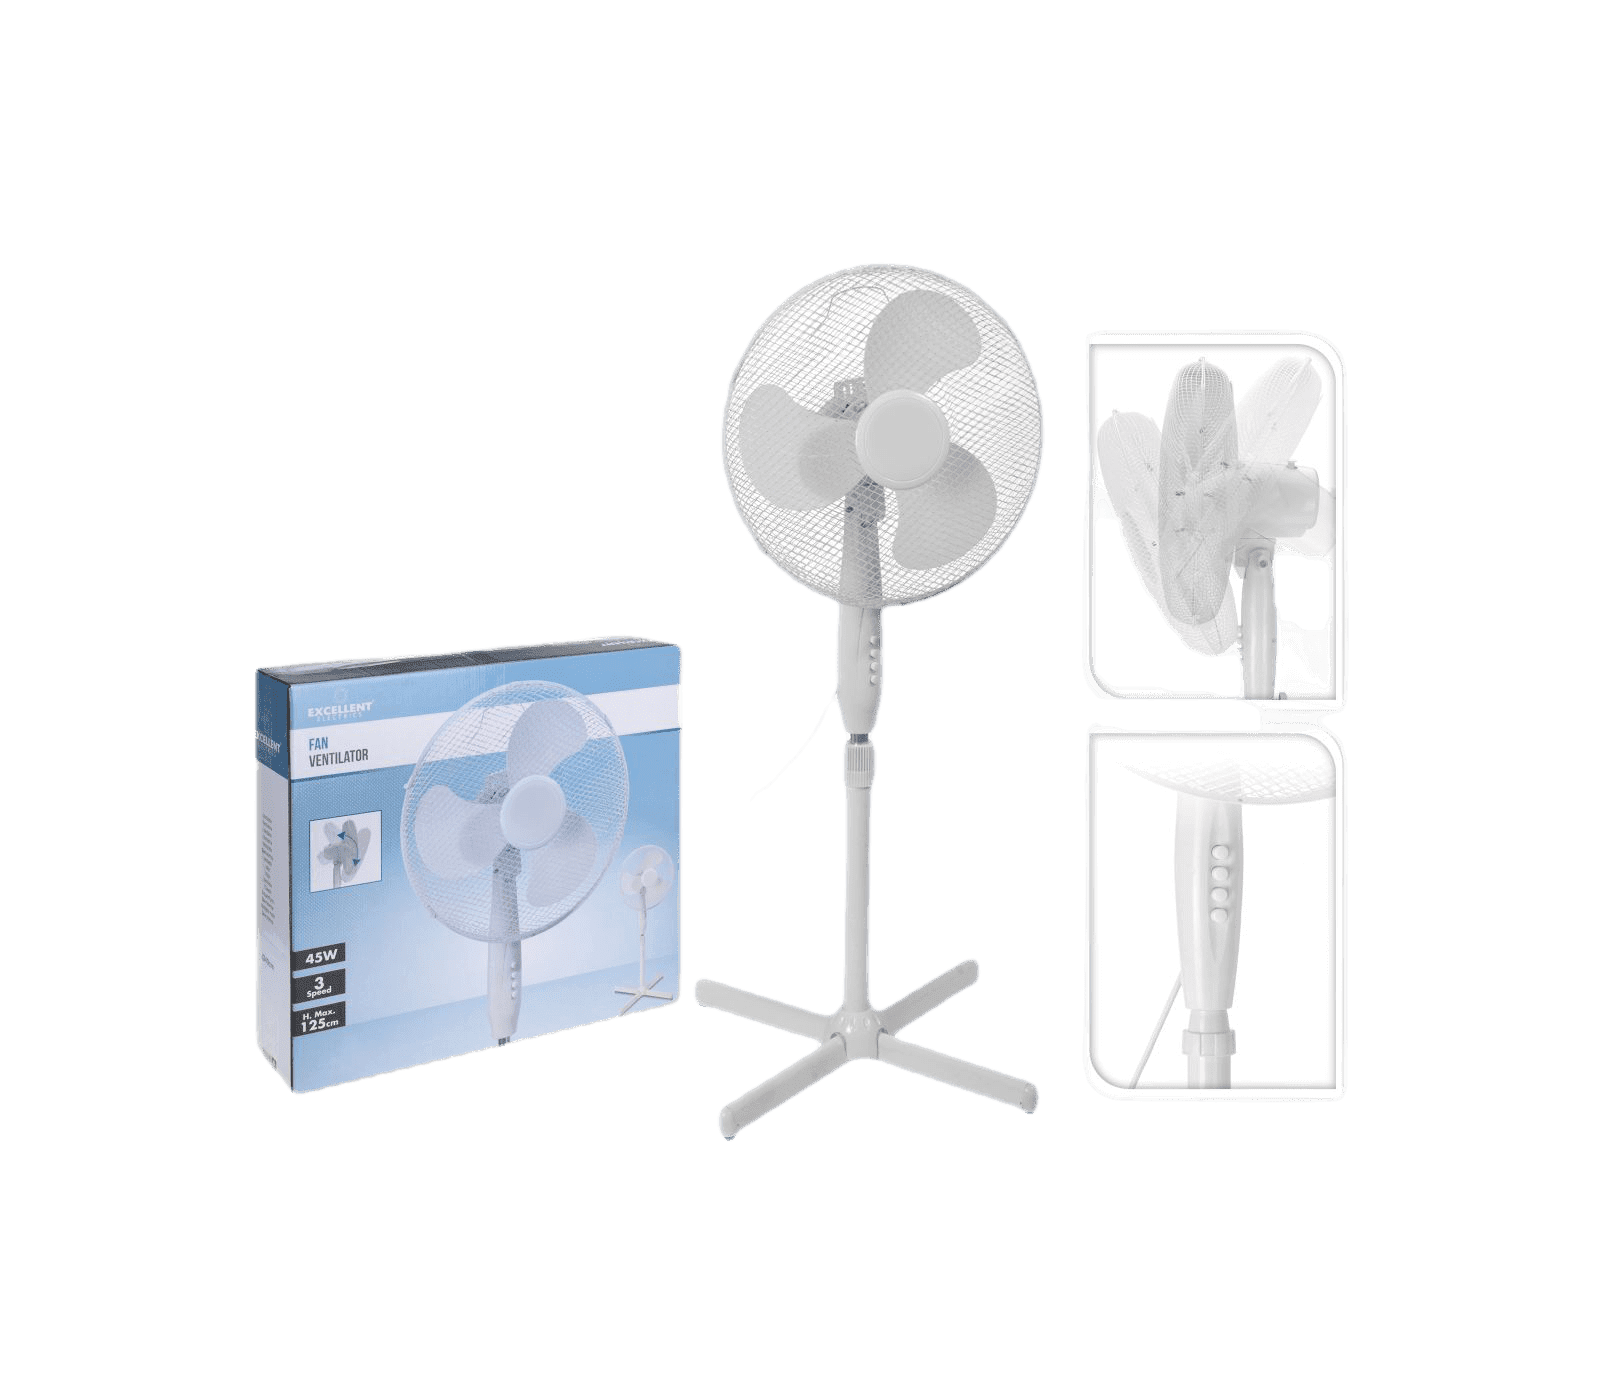 Ventilator staand dia 40cm wit